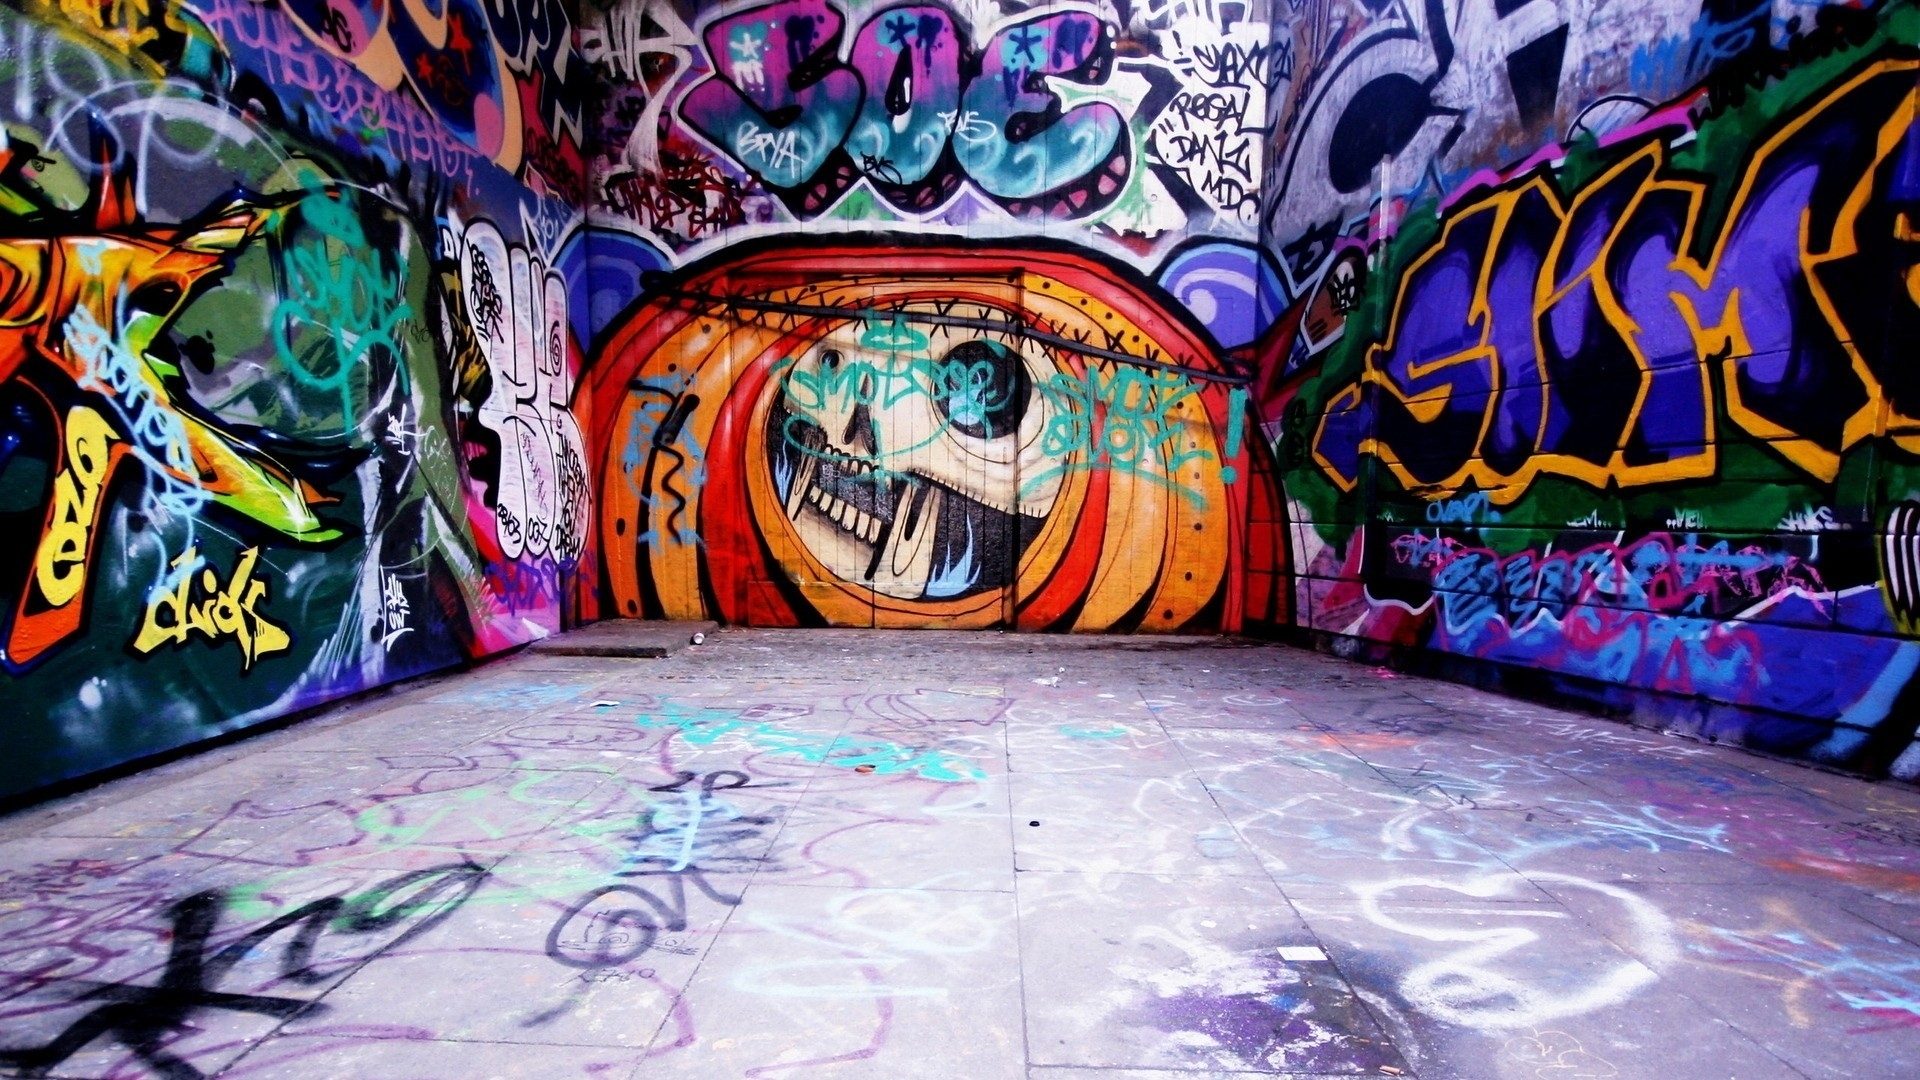 Graffiti Wall Art Wallpaper | Allwallpaper (View 6 of 20)